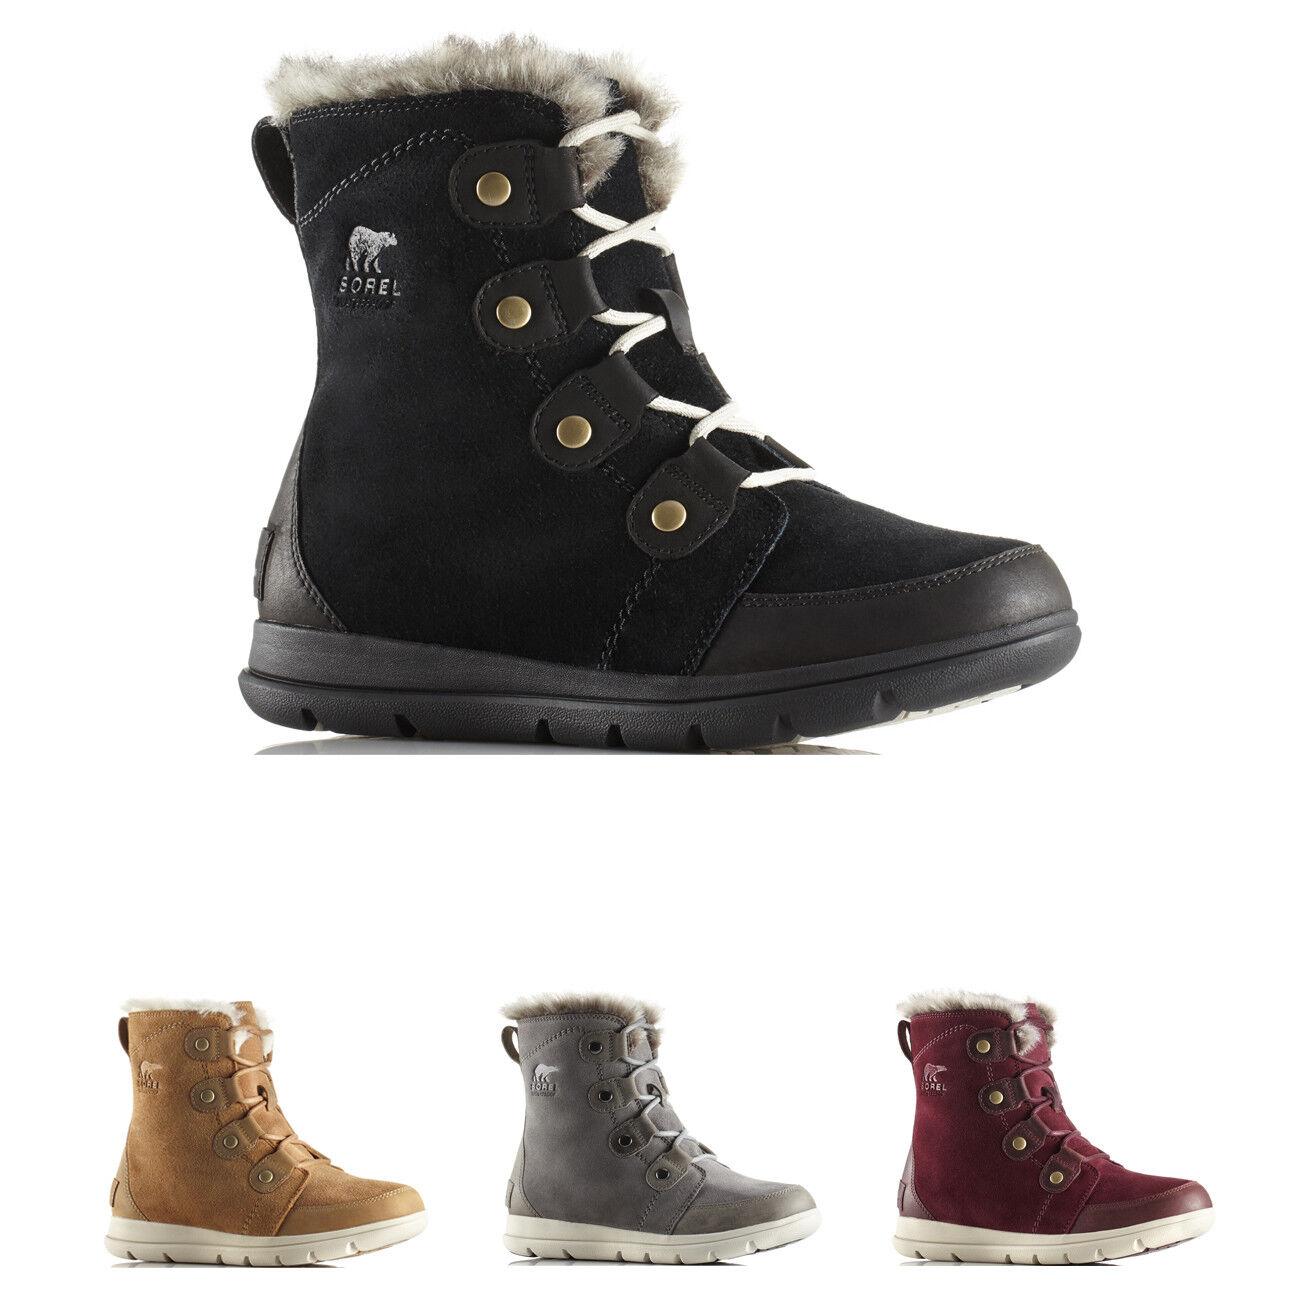 consegna veloce donna Sorel Explorer Joan Snow Suede Rain Winter Ankle Ankle Ankle Waterproof stivali US 5-11  ordina adesso